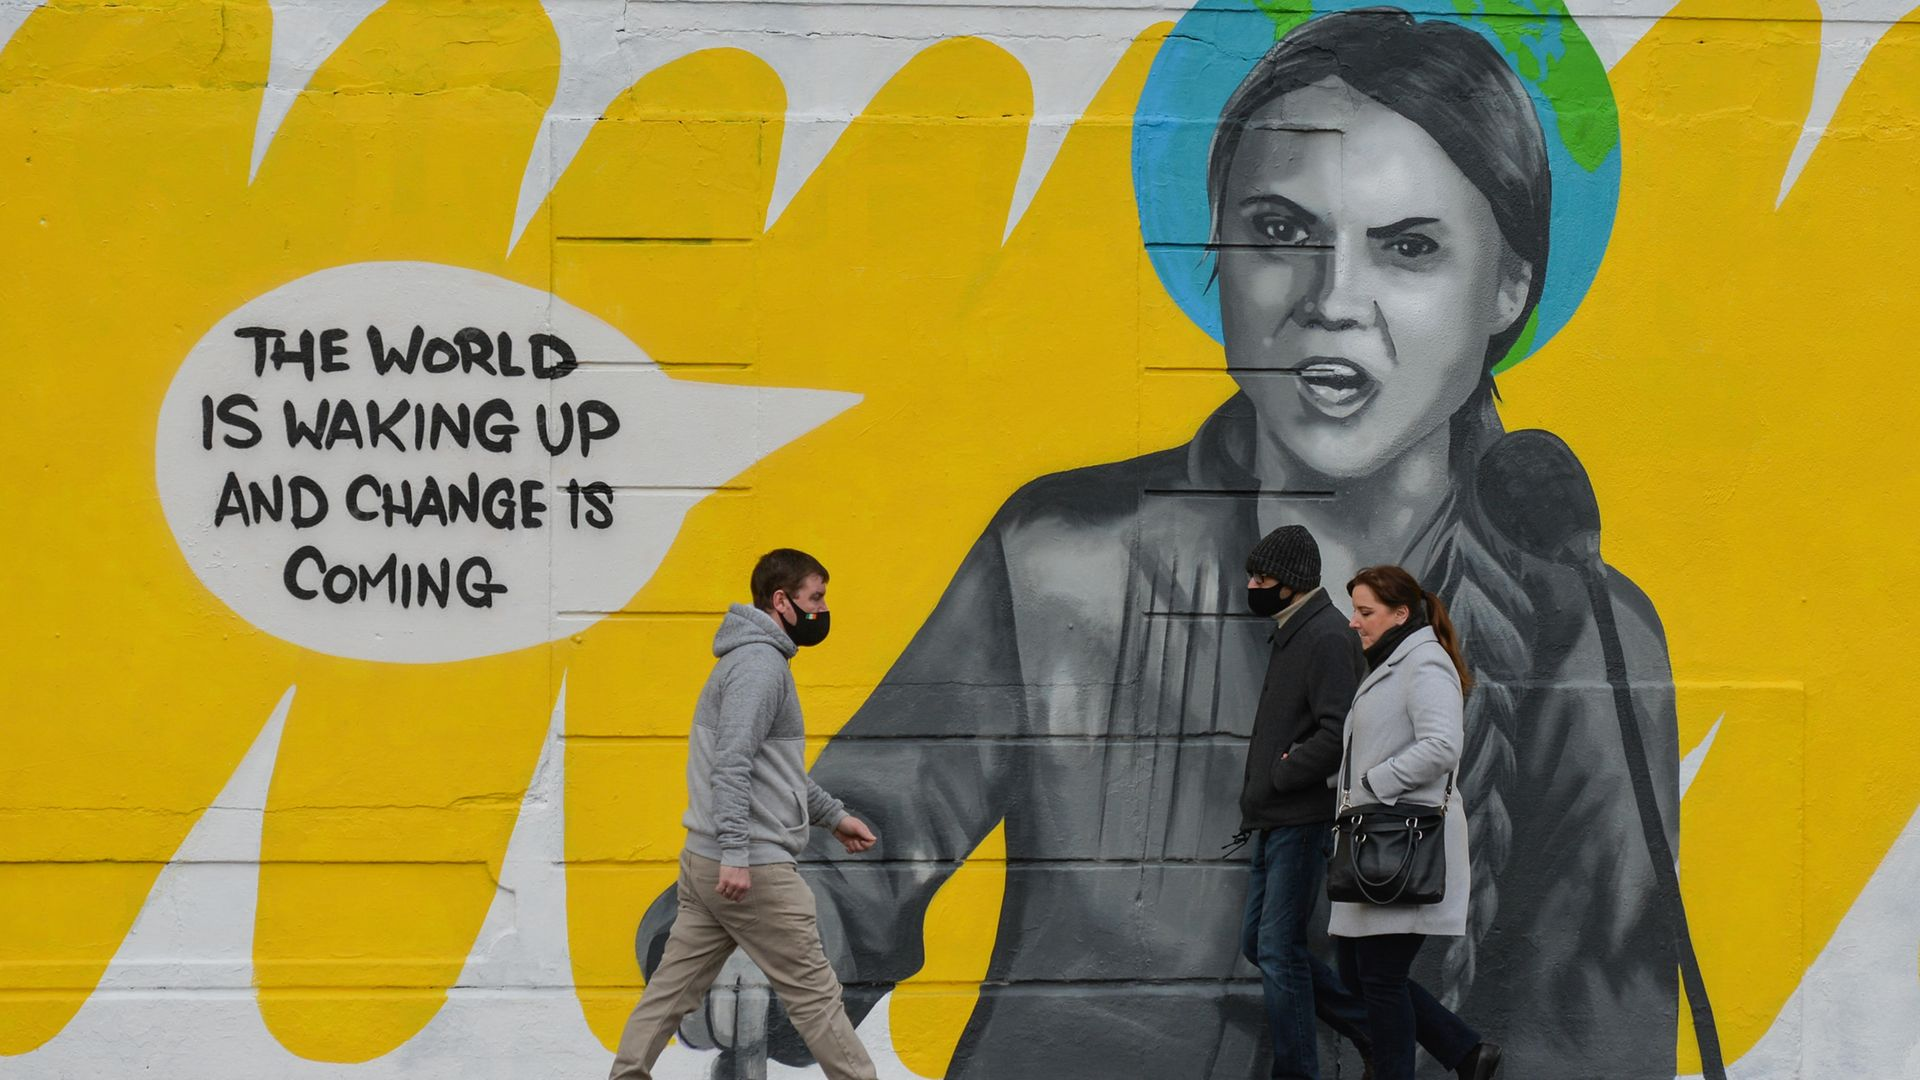 People walk by a mural in Dublin city centre of Swedish environmental activist Greta Thunberg - Credit: NurPhoto via Getty Images